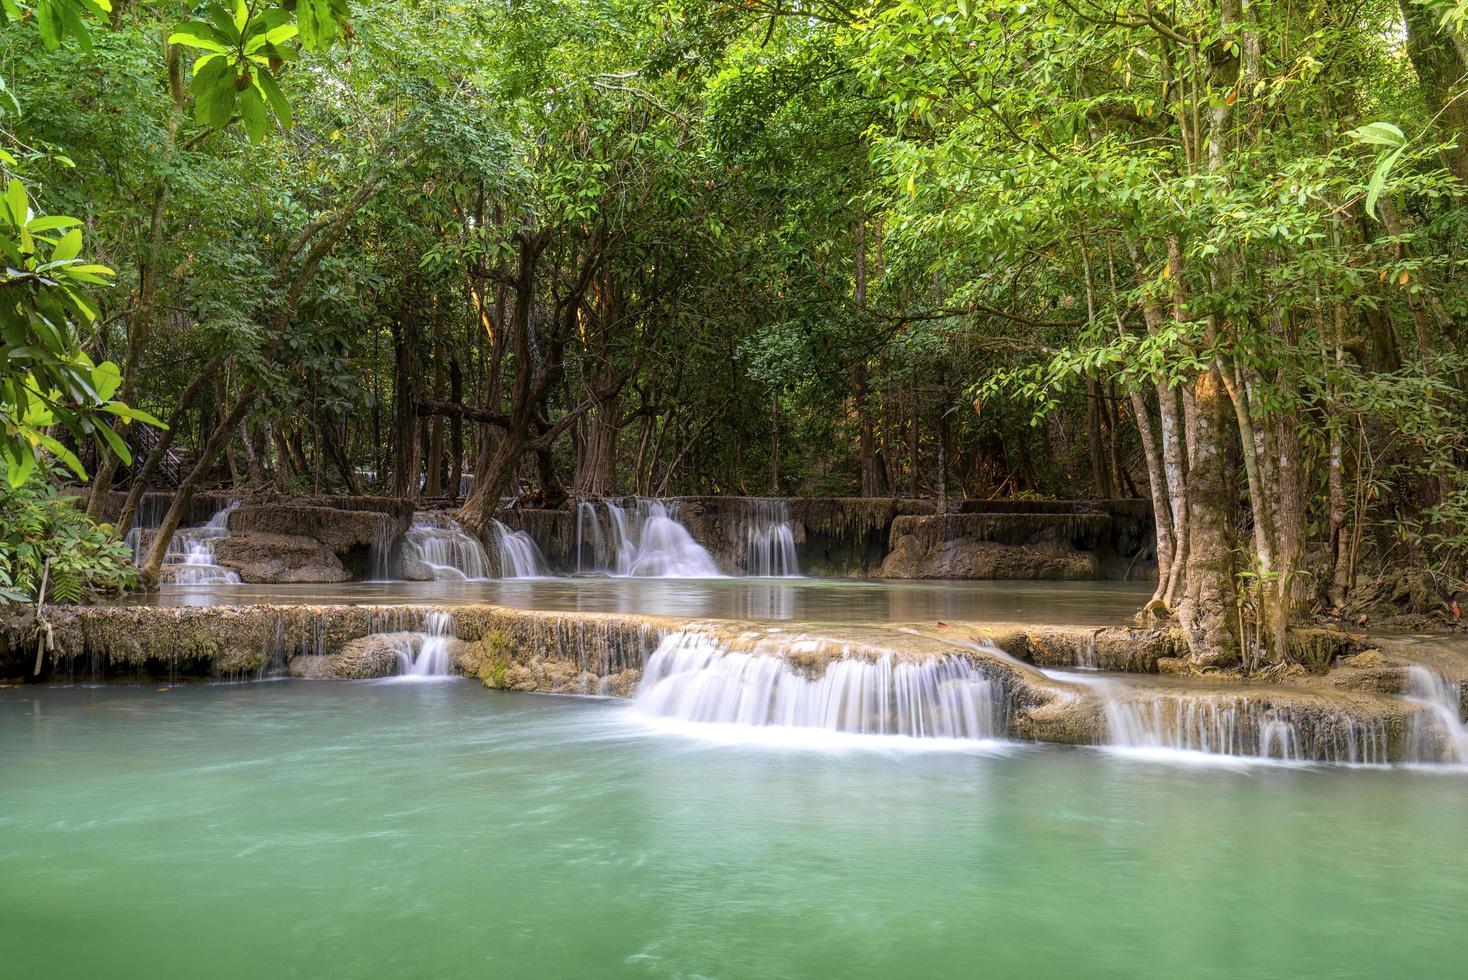 vattenfall i khuean srinagarindra nationalpark foto